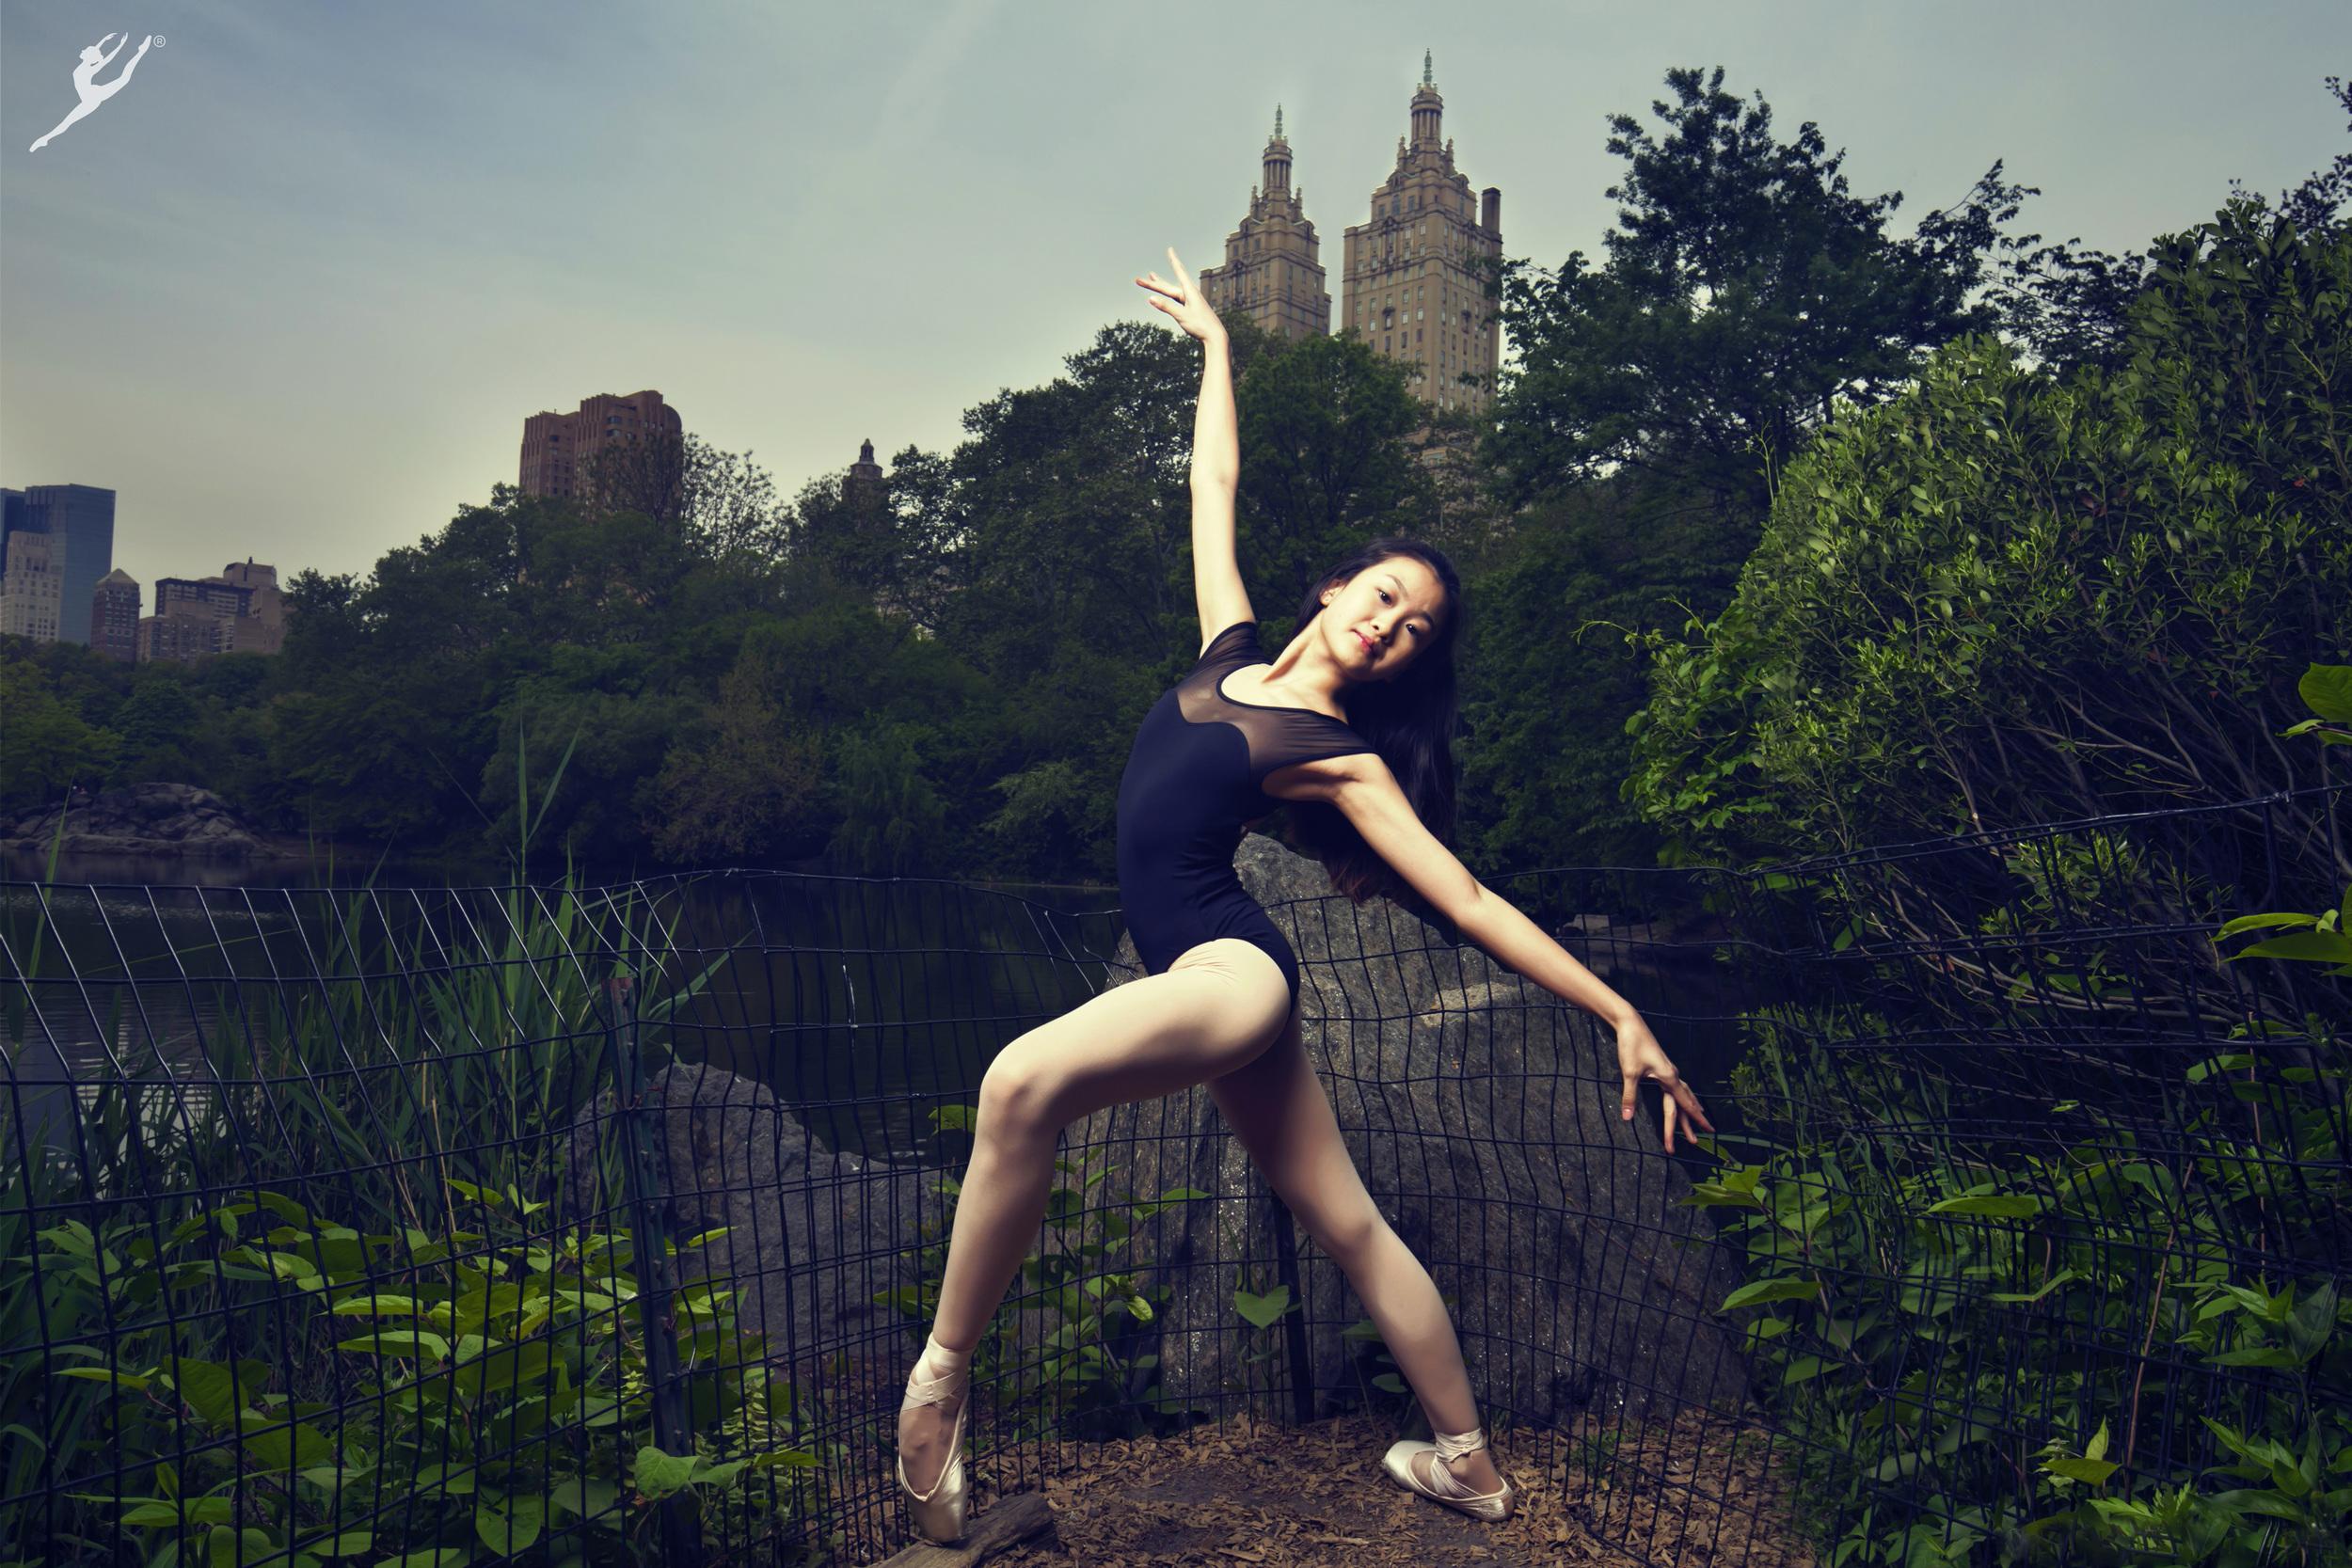 Amarra Hong in Central Park, New York for Energetiks. Photographer: Kevin Richardson